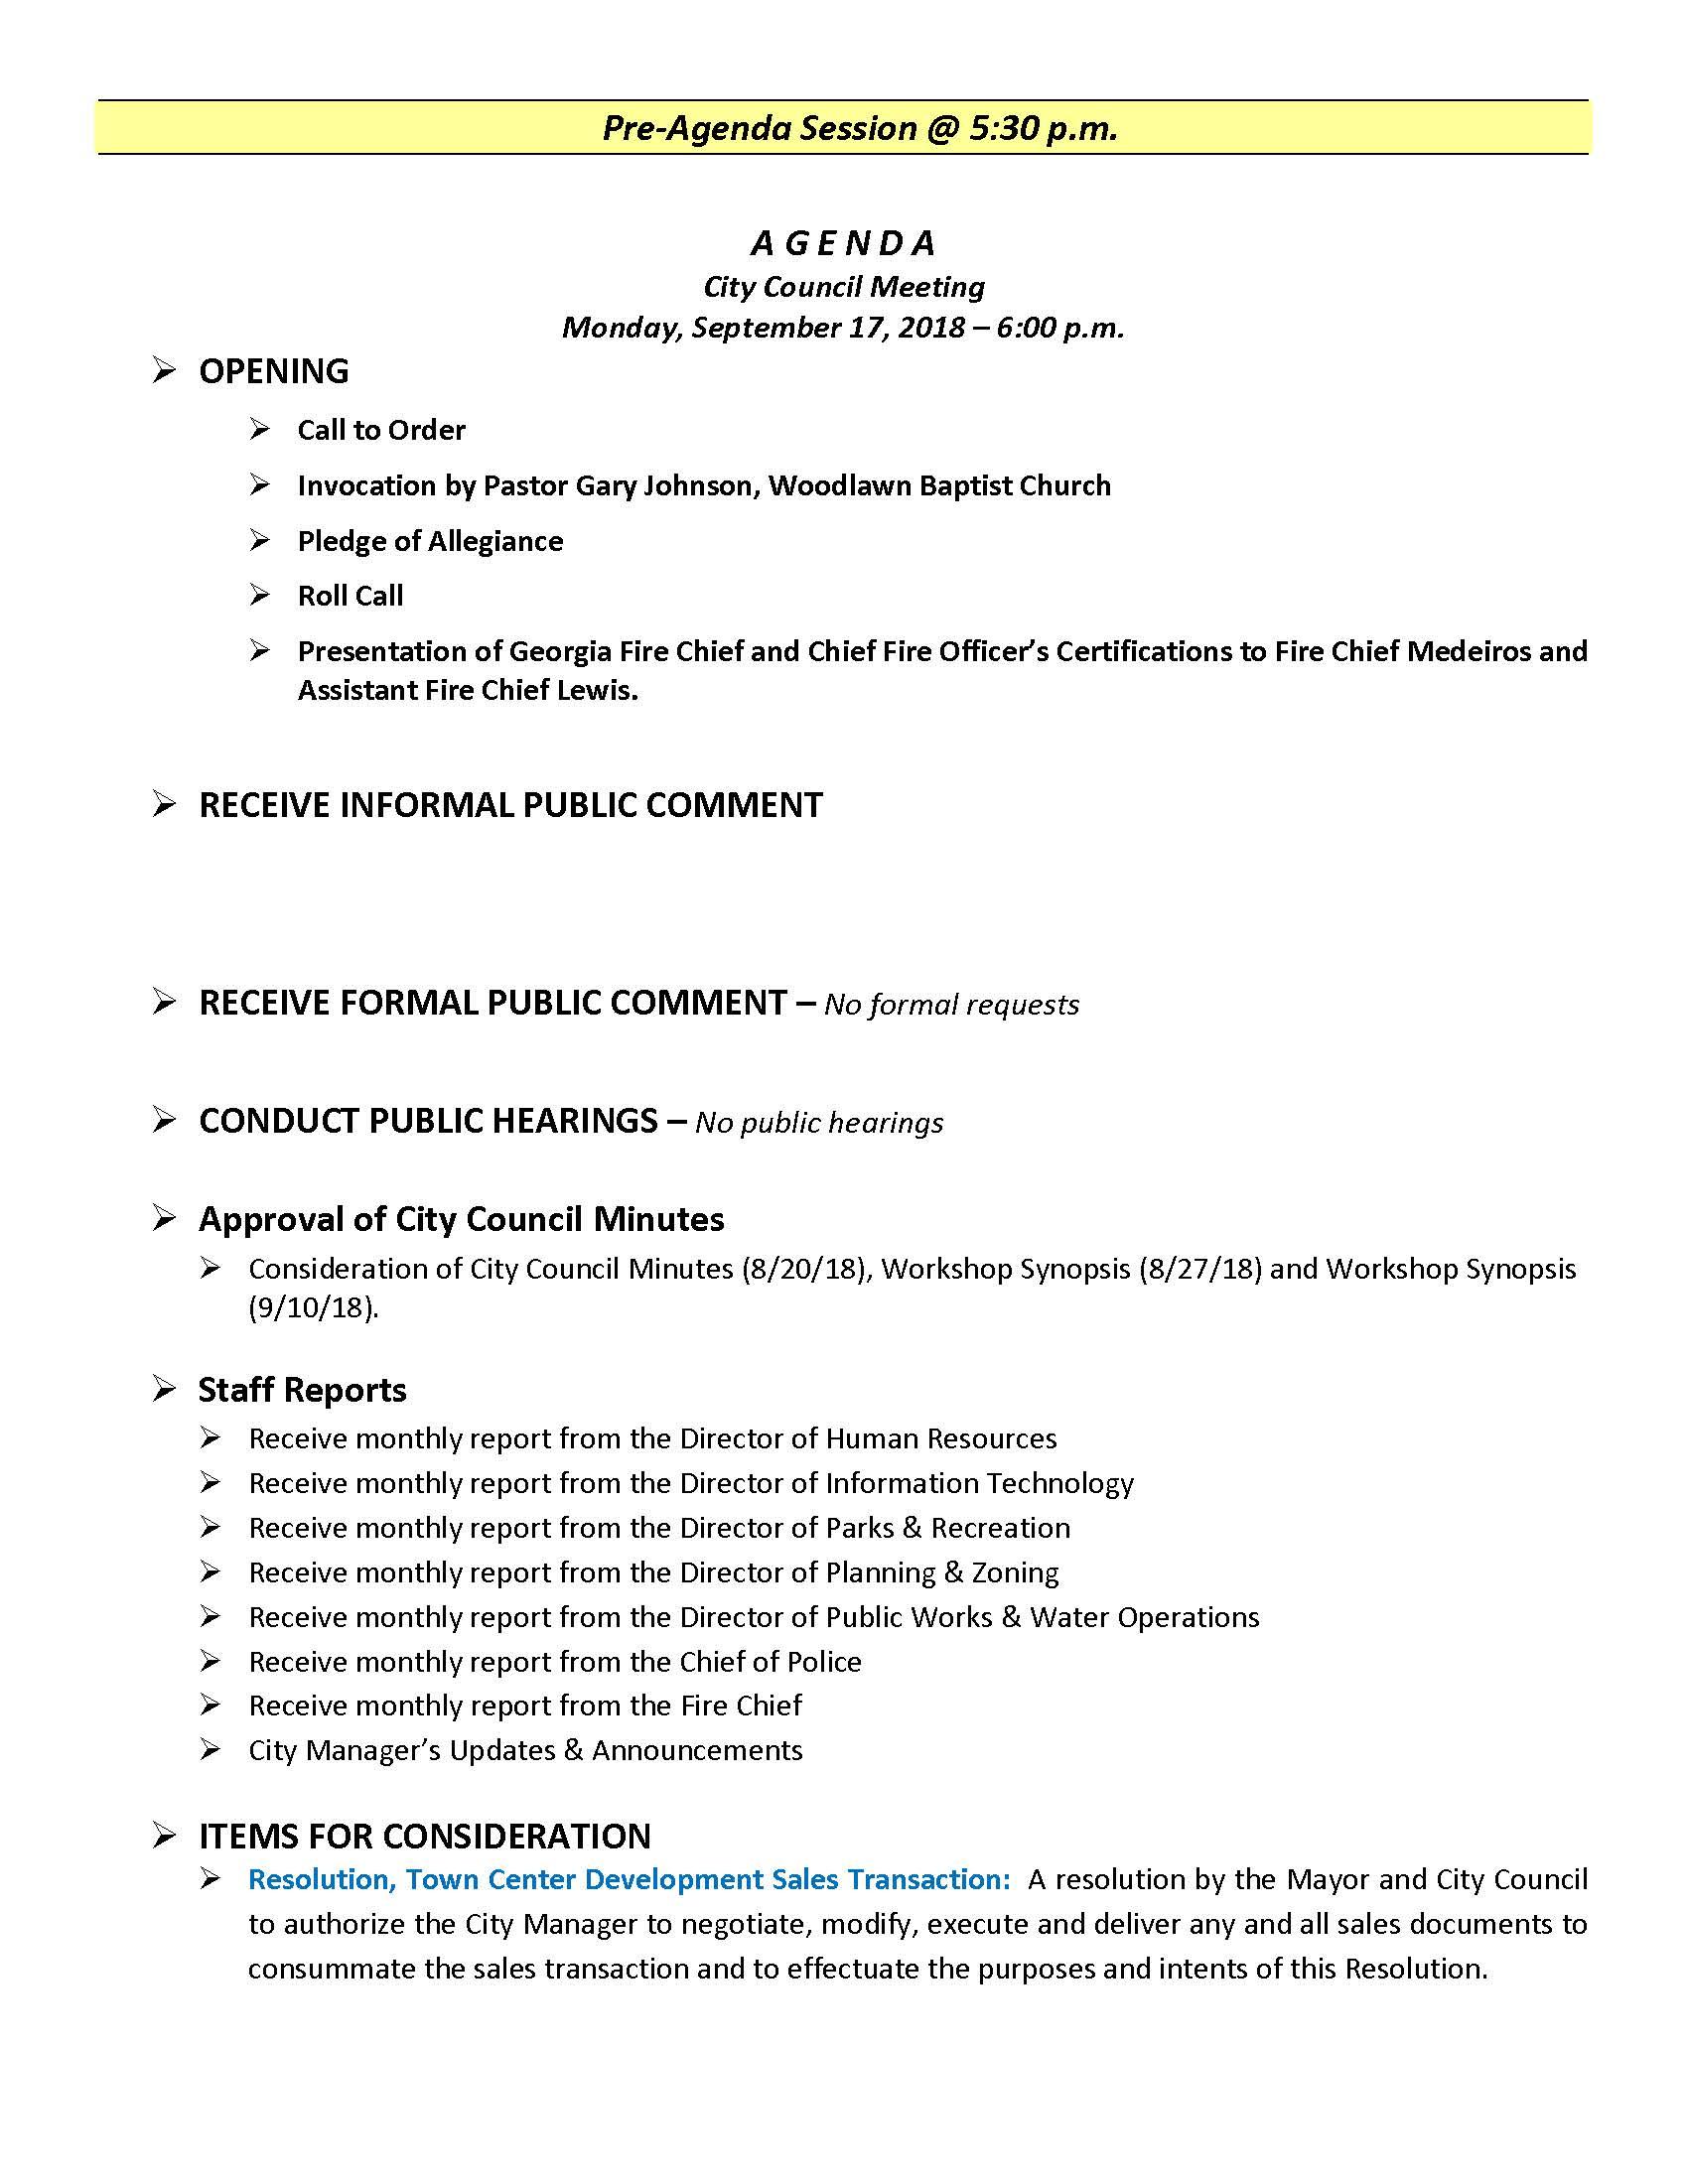 Agenda 9-17_Page_1